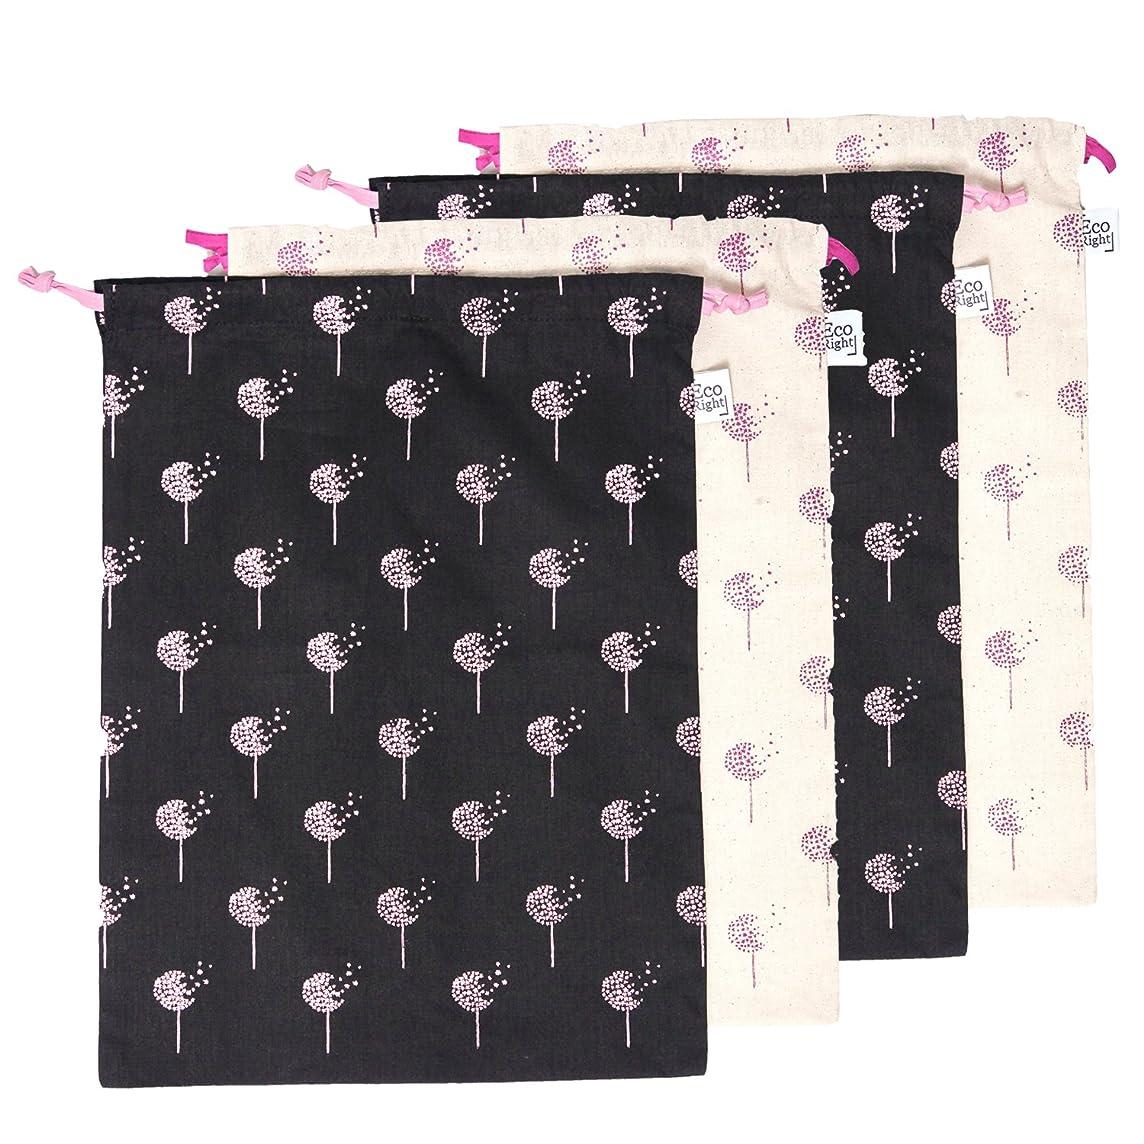 EcoRight Drawstring Shoe Pouch Storage Travel Organizer Bag 100% Cotton Multipurpose Printed